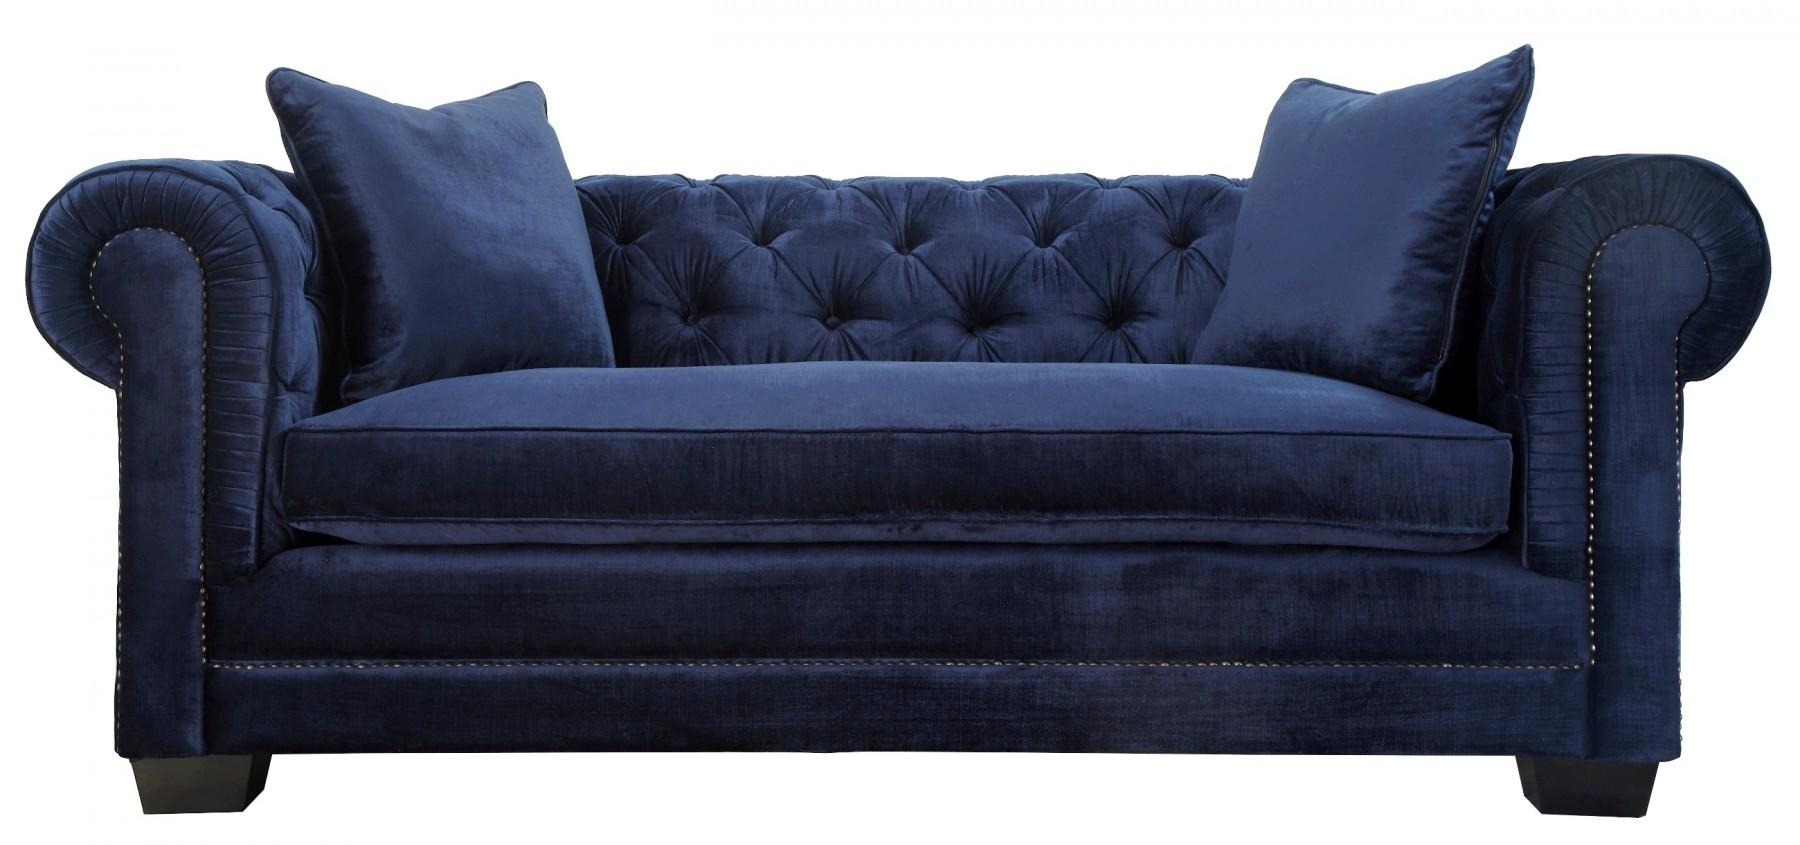 Norwalk Sofas Sofa Menzilperde In Norwalk Sofa And Chairs (Image 13 of 15)